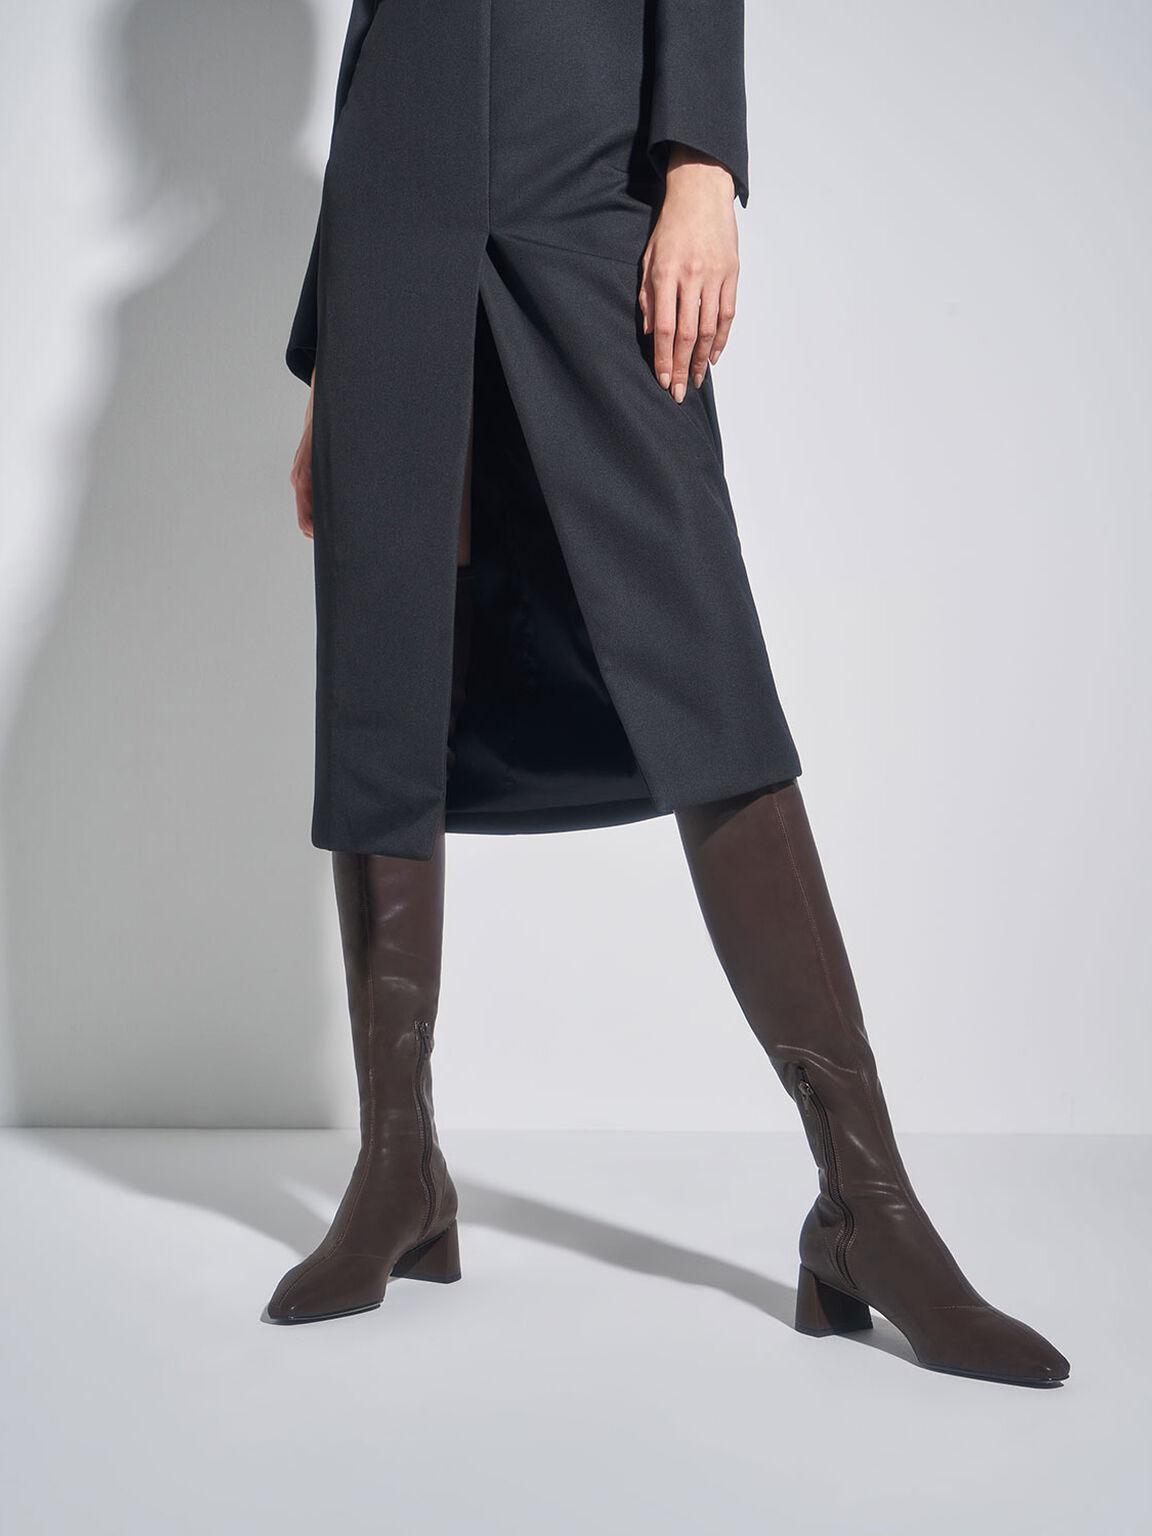 Thigh High Blade Heel Boots, Dark Brown, hi-res